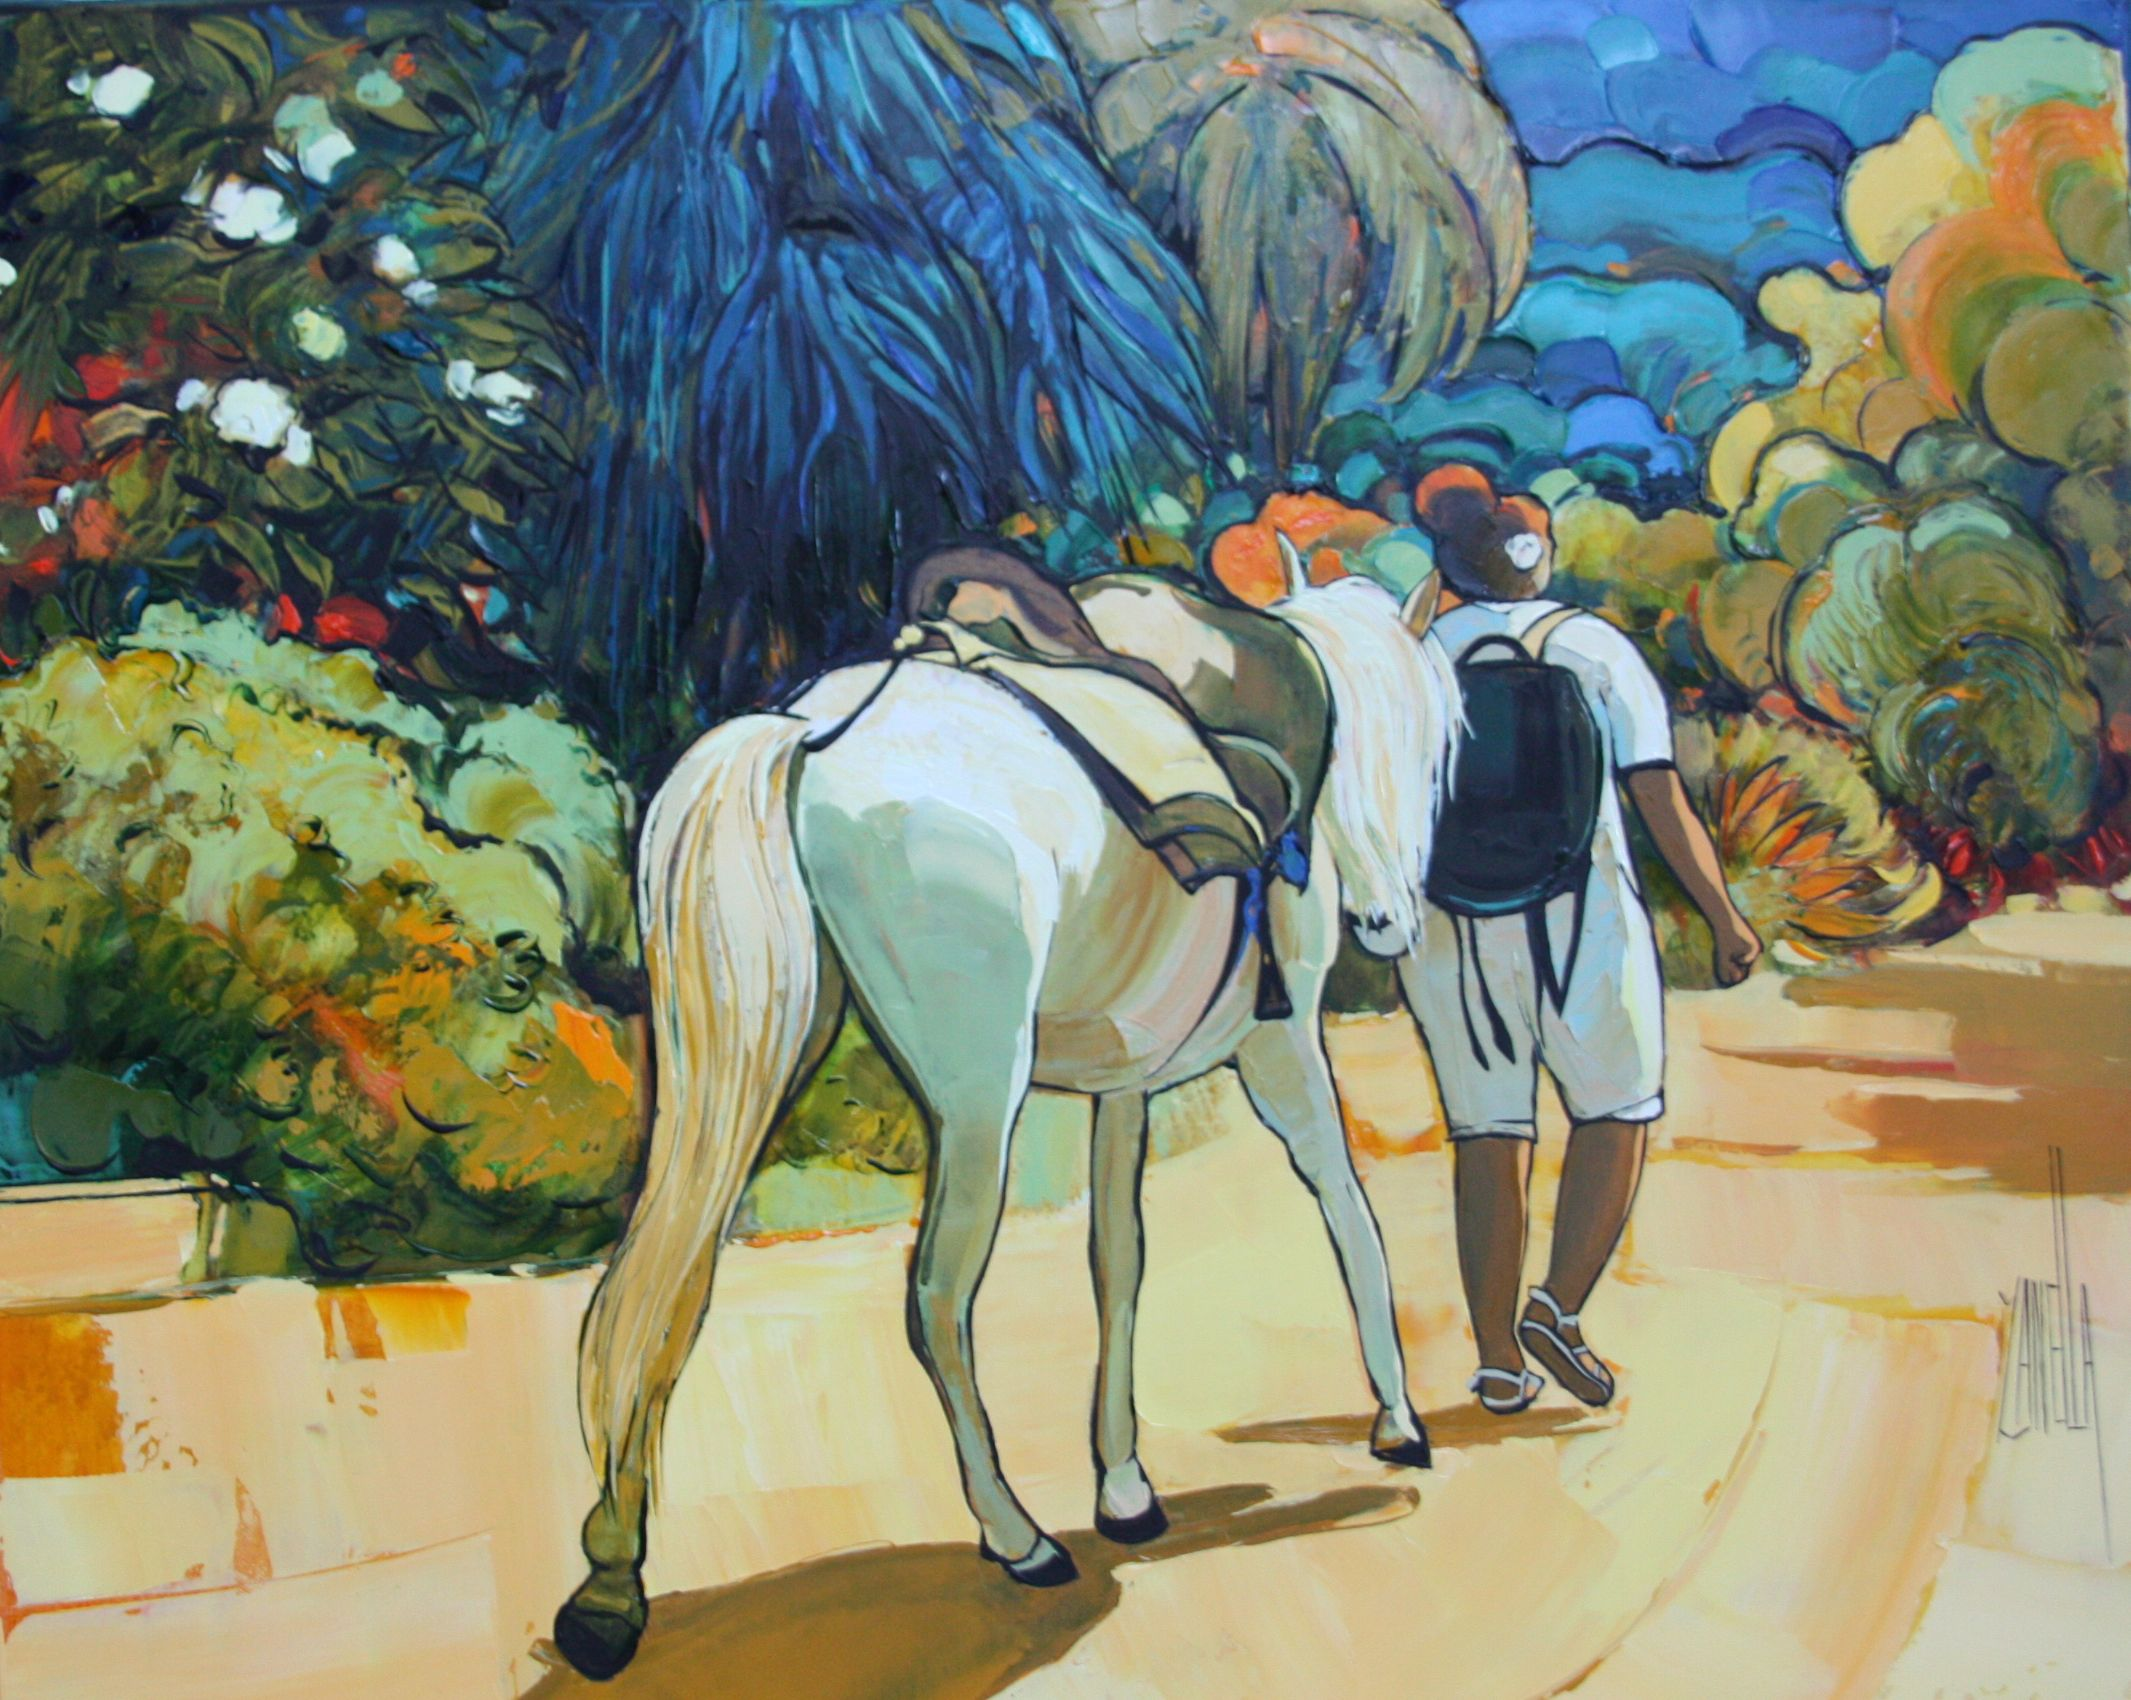 2014-Promenade à Nuku Hiva-ile des Marquises-6F